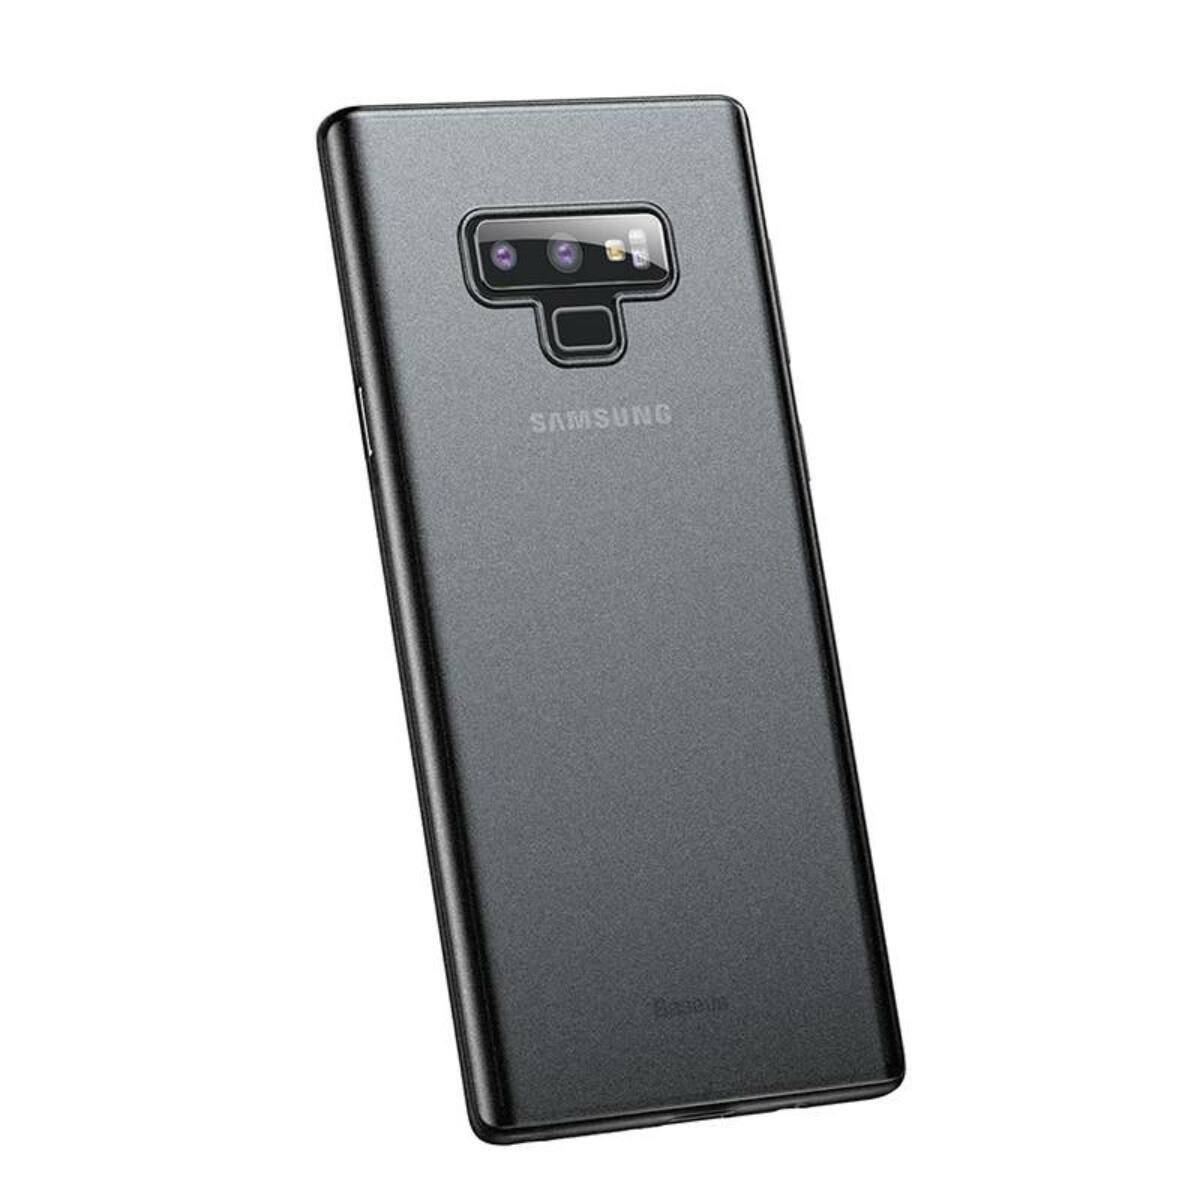 Baseus Samsung Note 9 tok, Wing, átlátszó, fekete (WISANOTE9-E01)